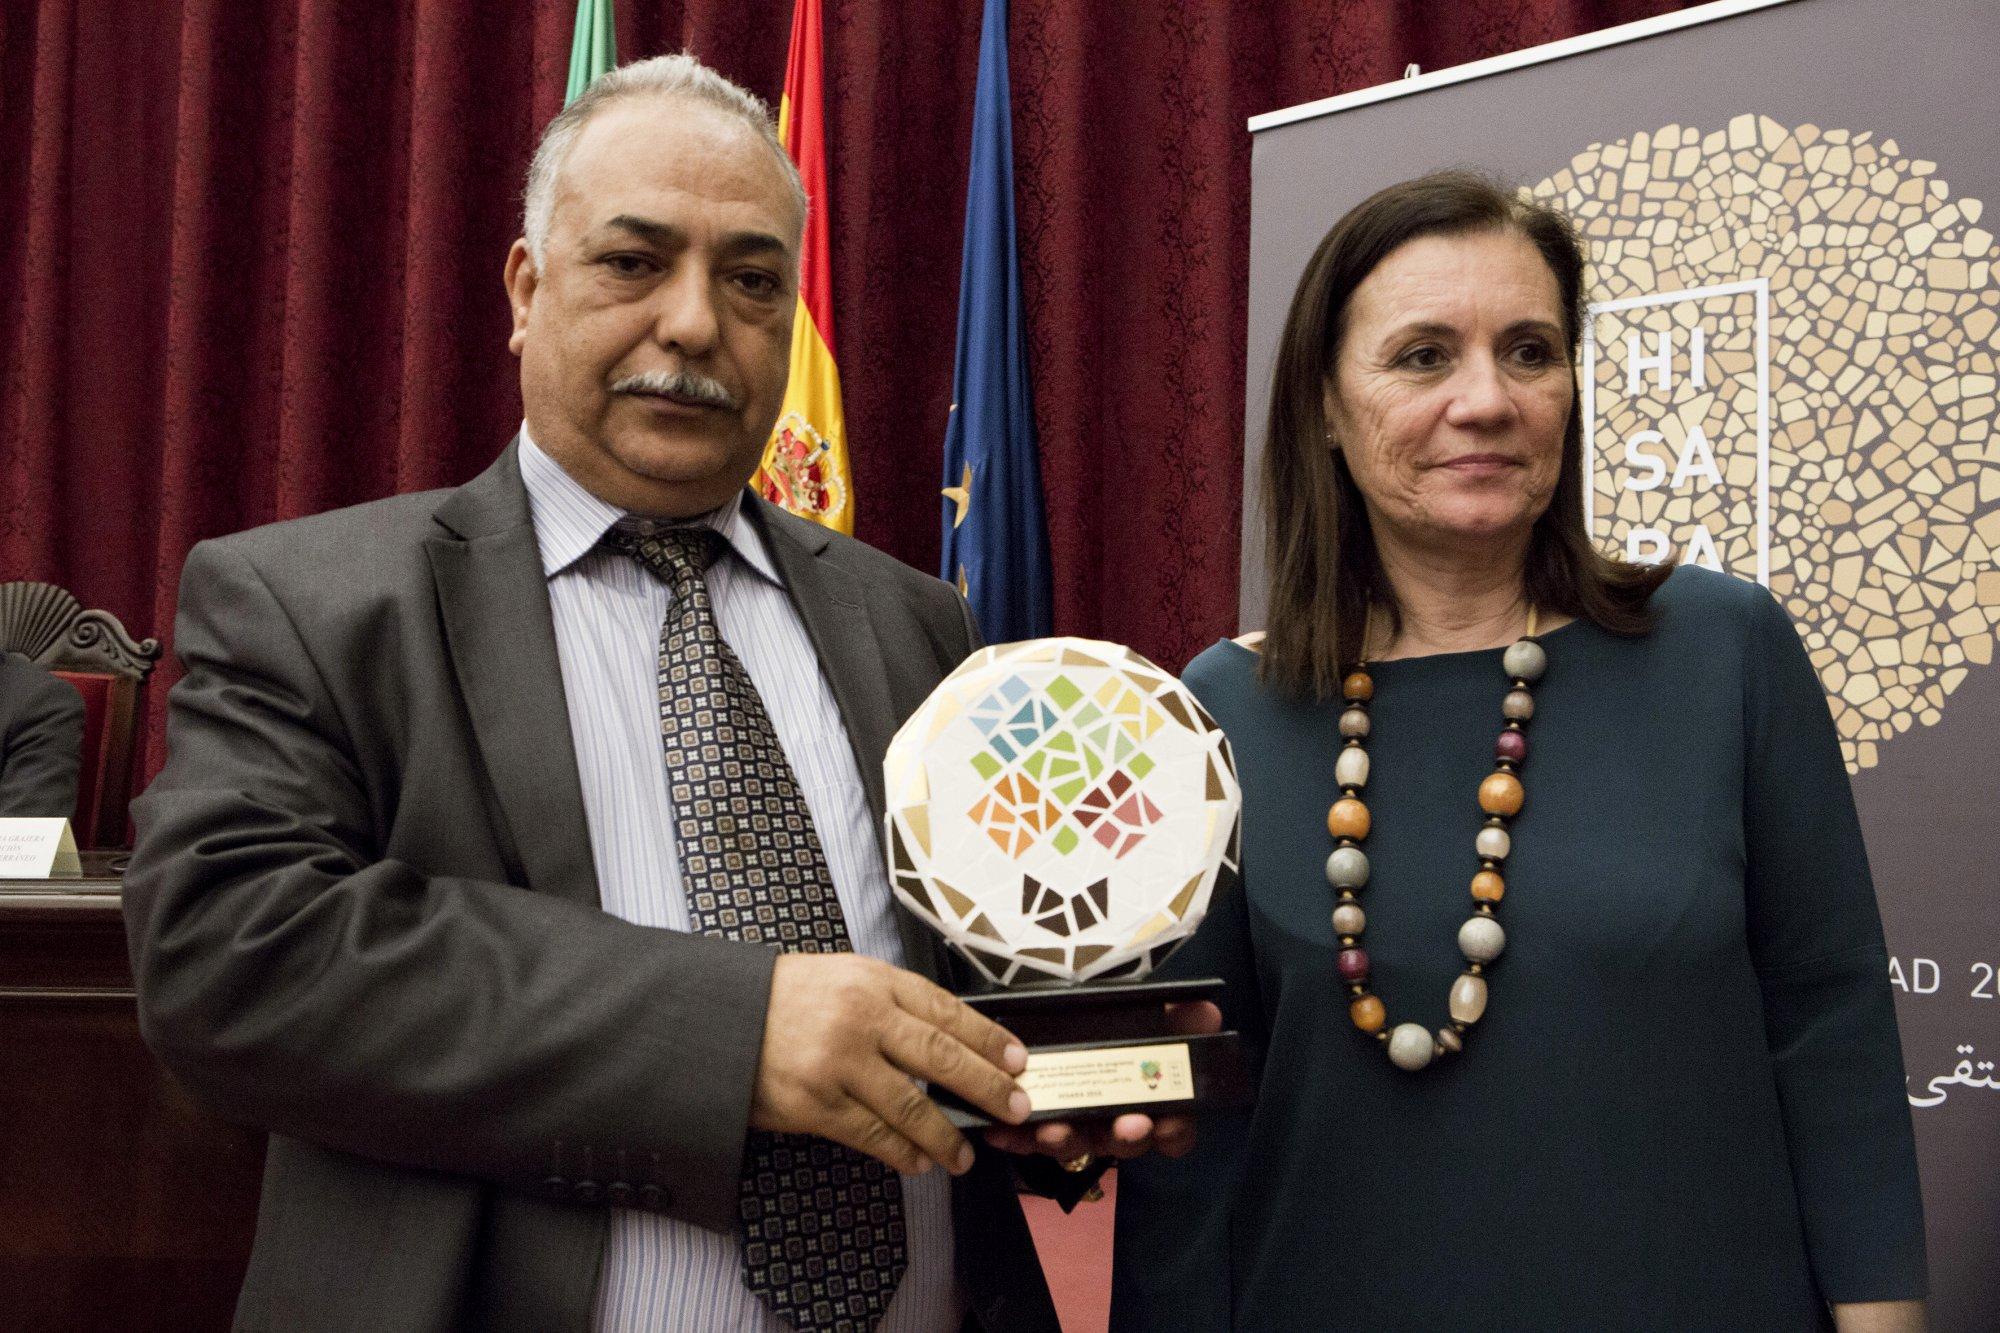 Mr. Hadoud from Alzytoona University in Libya and Ms. Rafela Caballero from Universidad de Sevilla